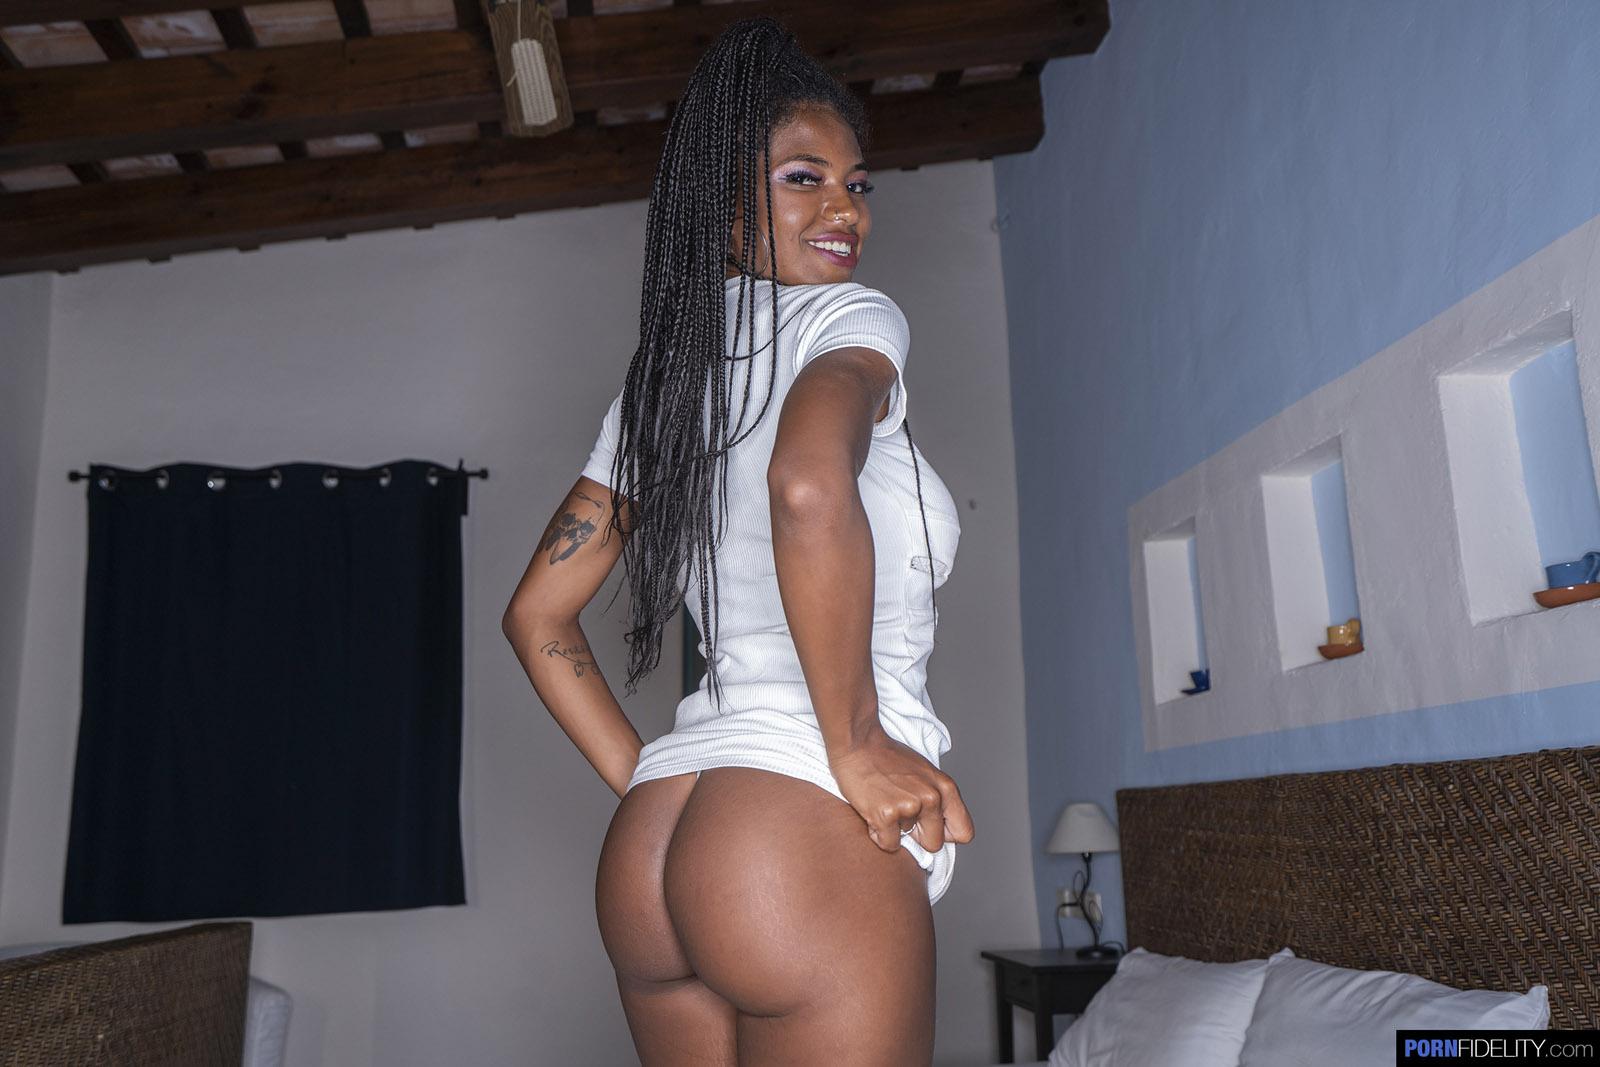 https://cdn.curvyerotic.com/wp-content/uploads/2020/09/tina-fire-shes-on-fire-pornfidelity-3.jpg